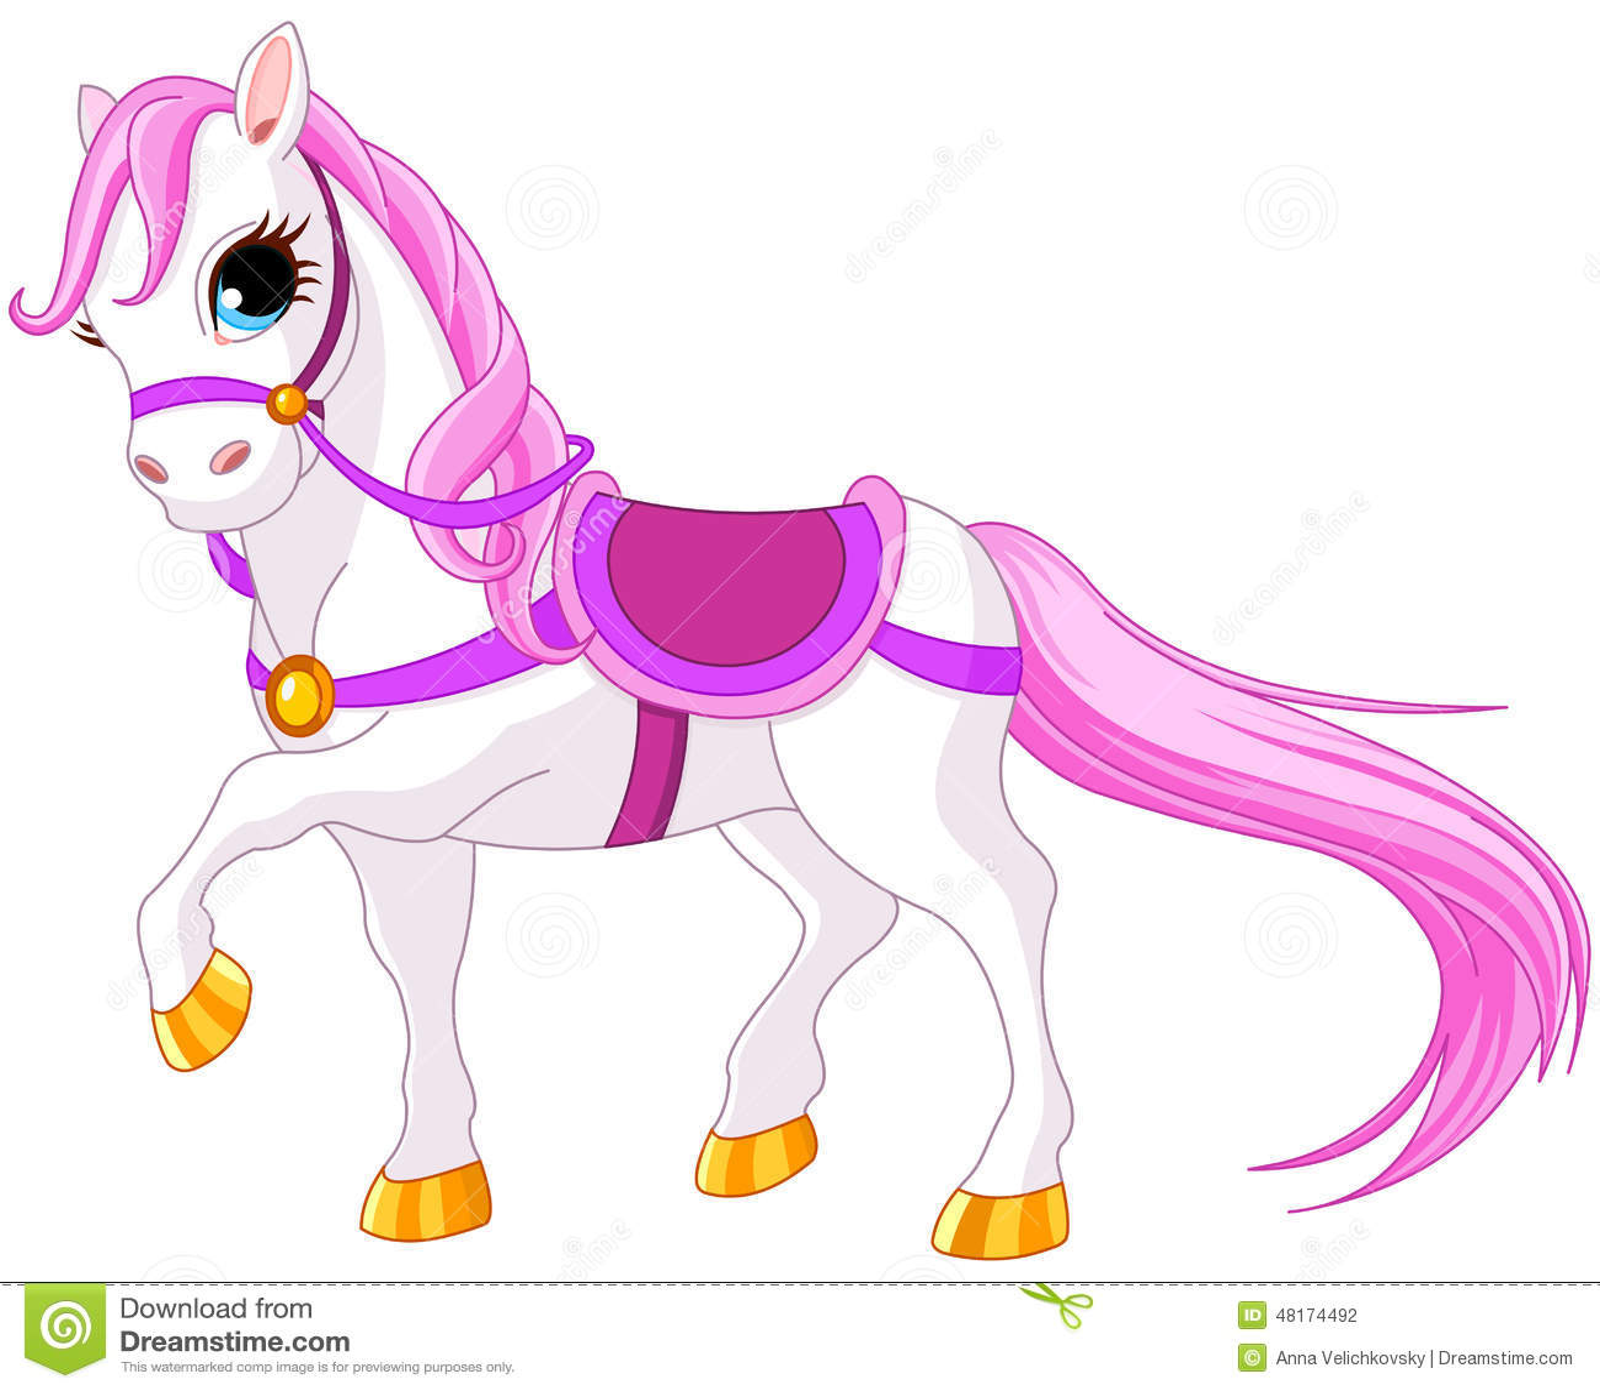 Princess Horse Images u0026 Pictures - Findpik